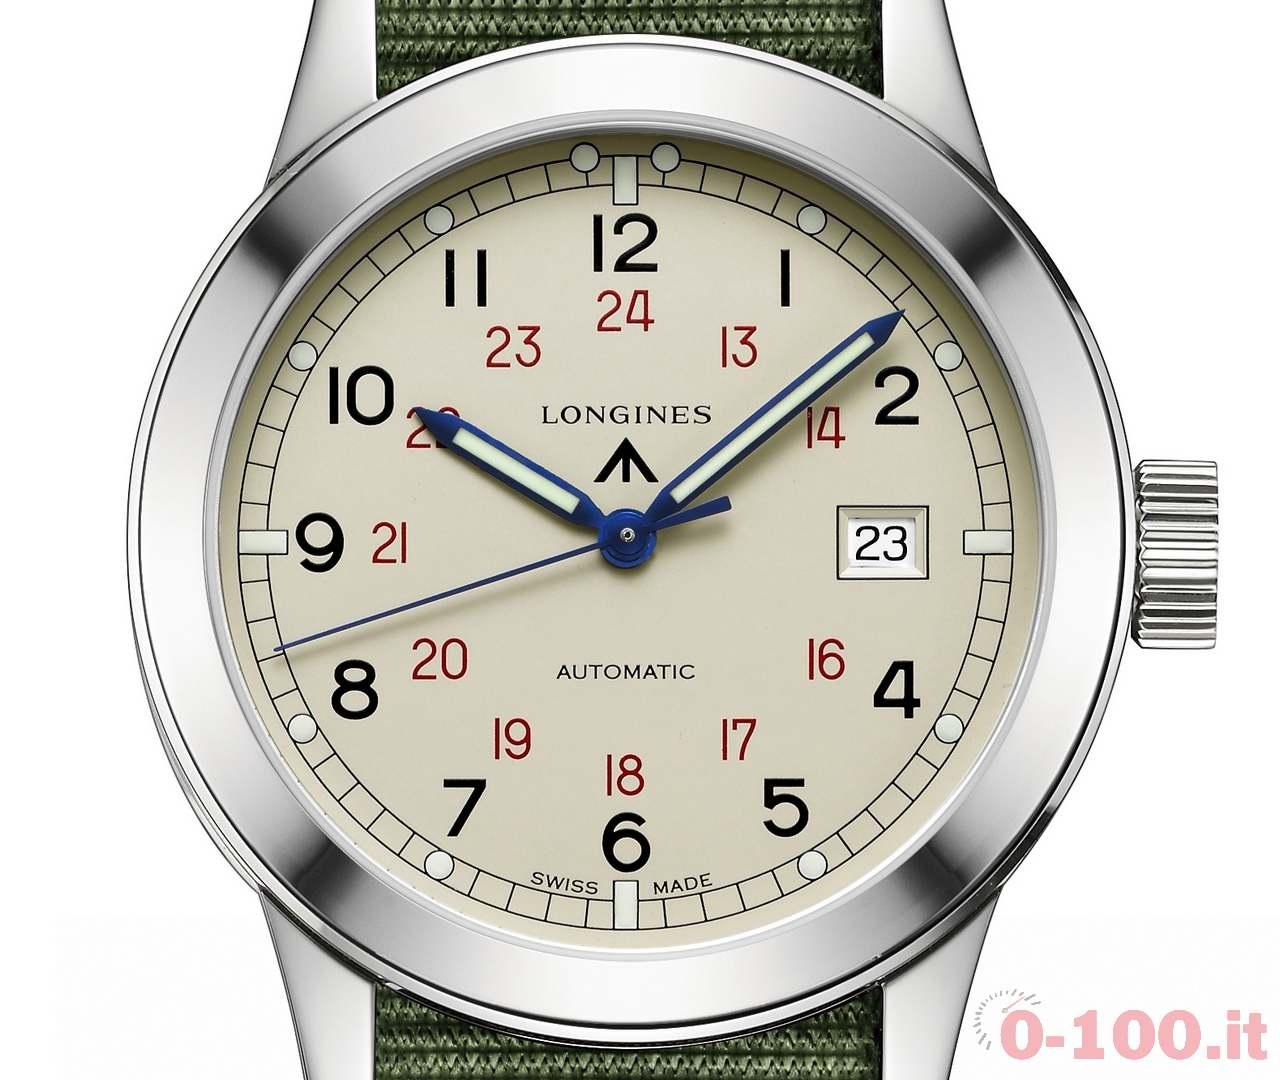 The Longines Heritage Military COSD Ref. L2.832.4.73.5_prezzo_price_0-1001